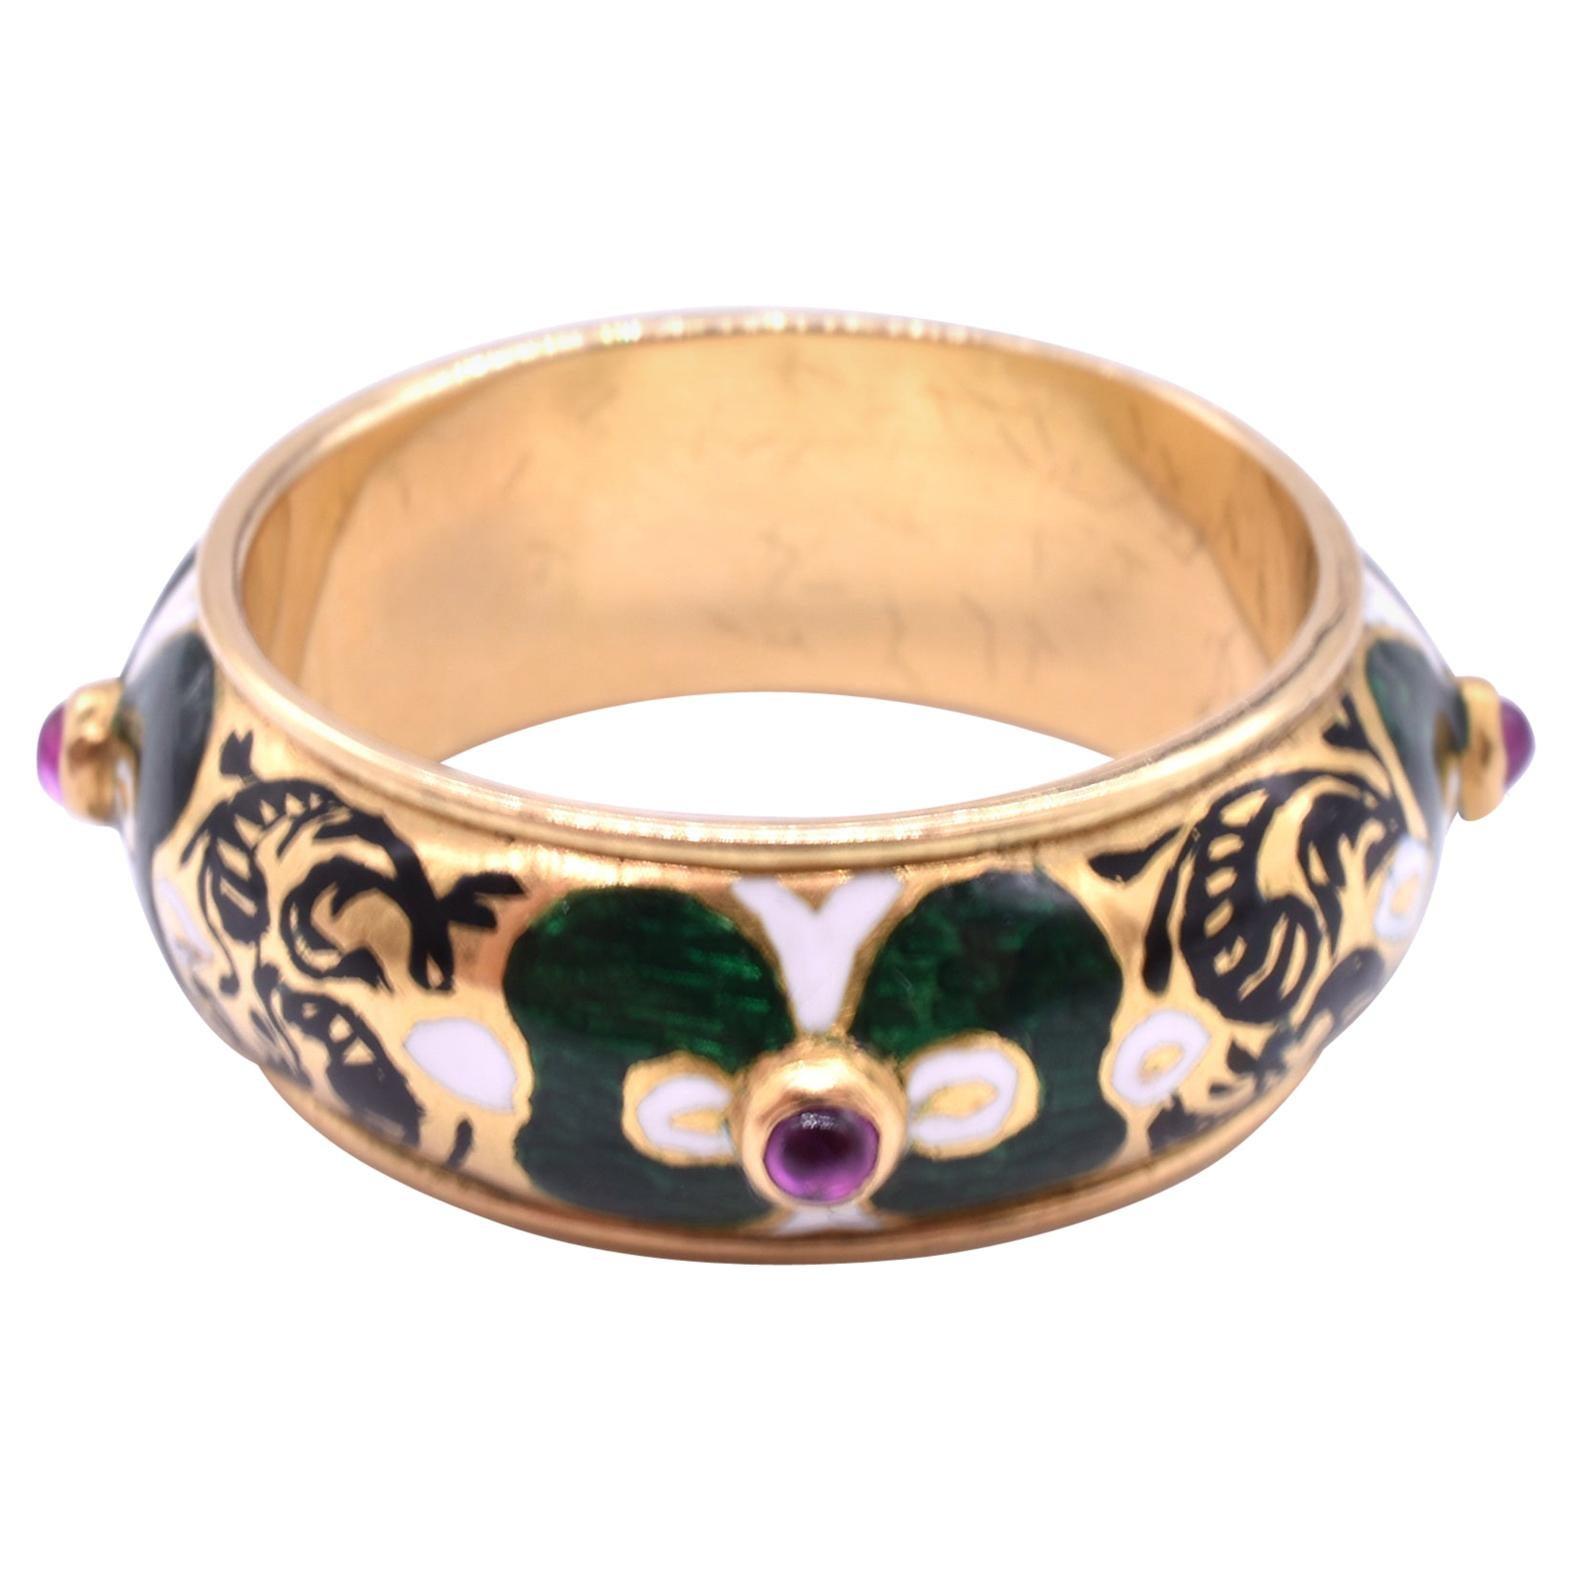 Antique Renaissance Revival Enamel and Ruby Ring